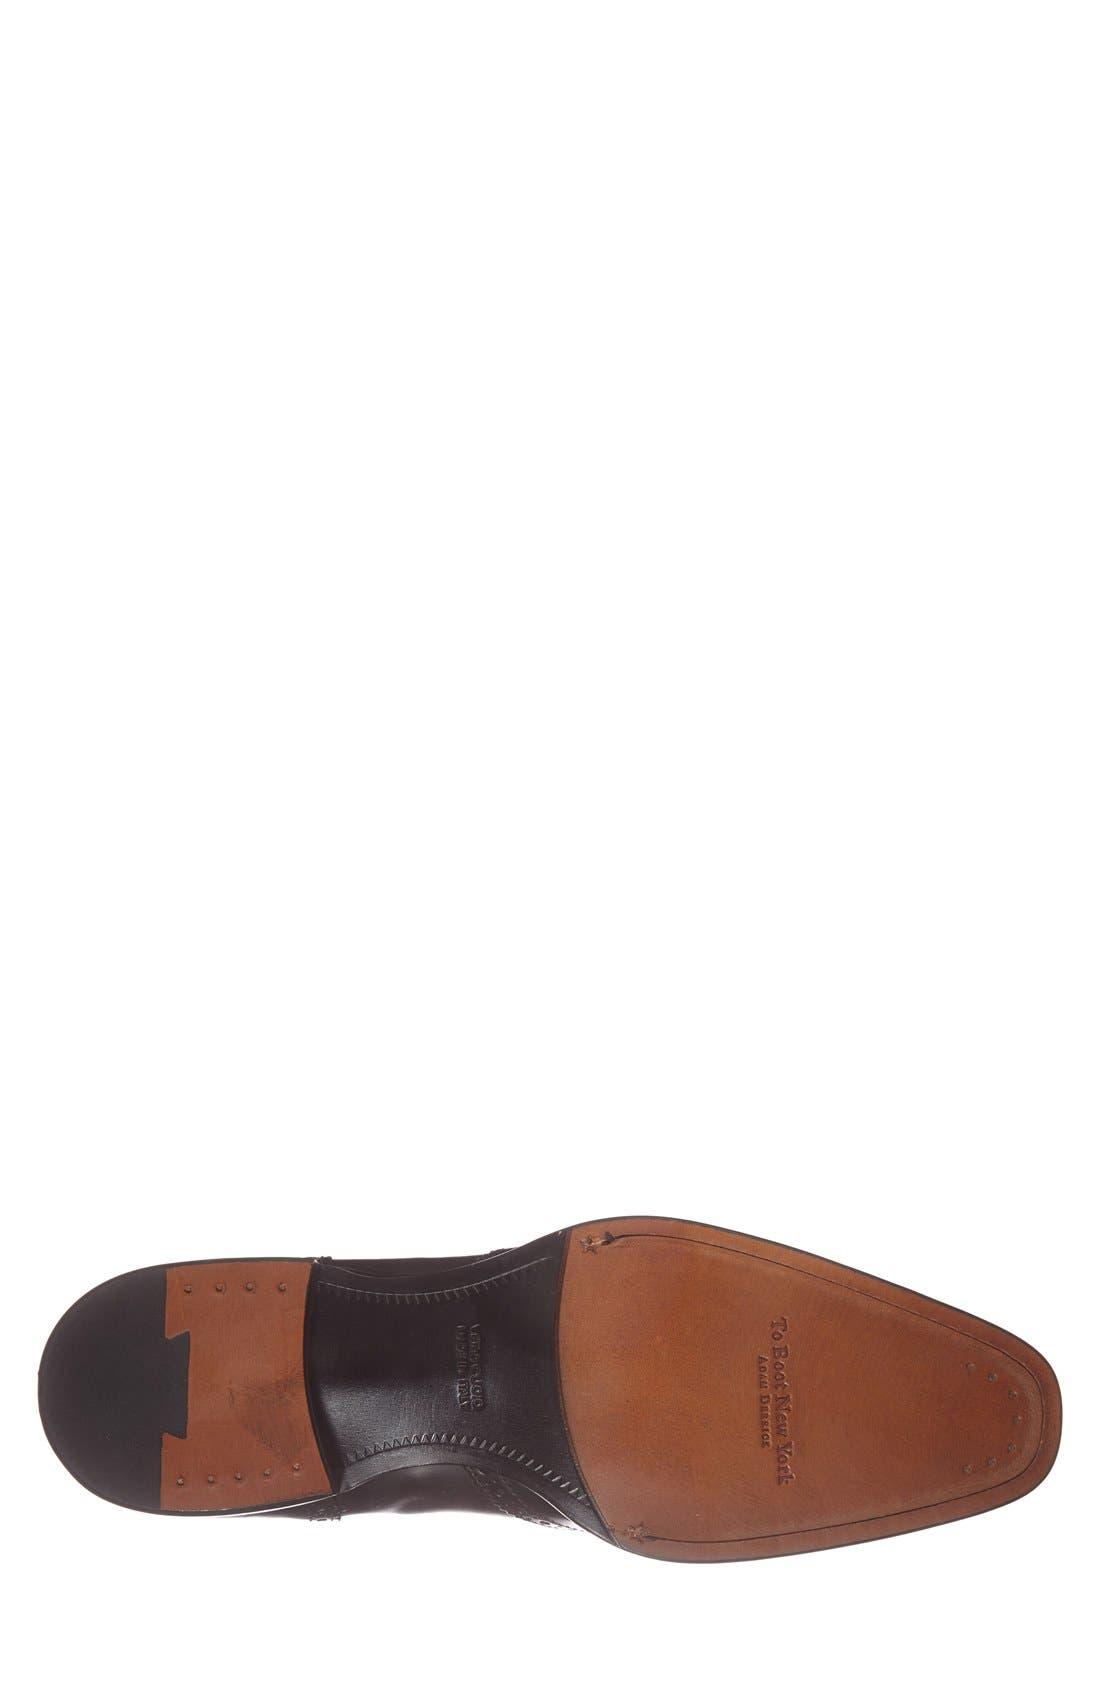 'Duke' Wingtip,                             Alternate thumbnail 6, color,                             Black Leather